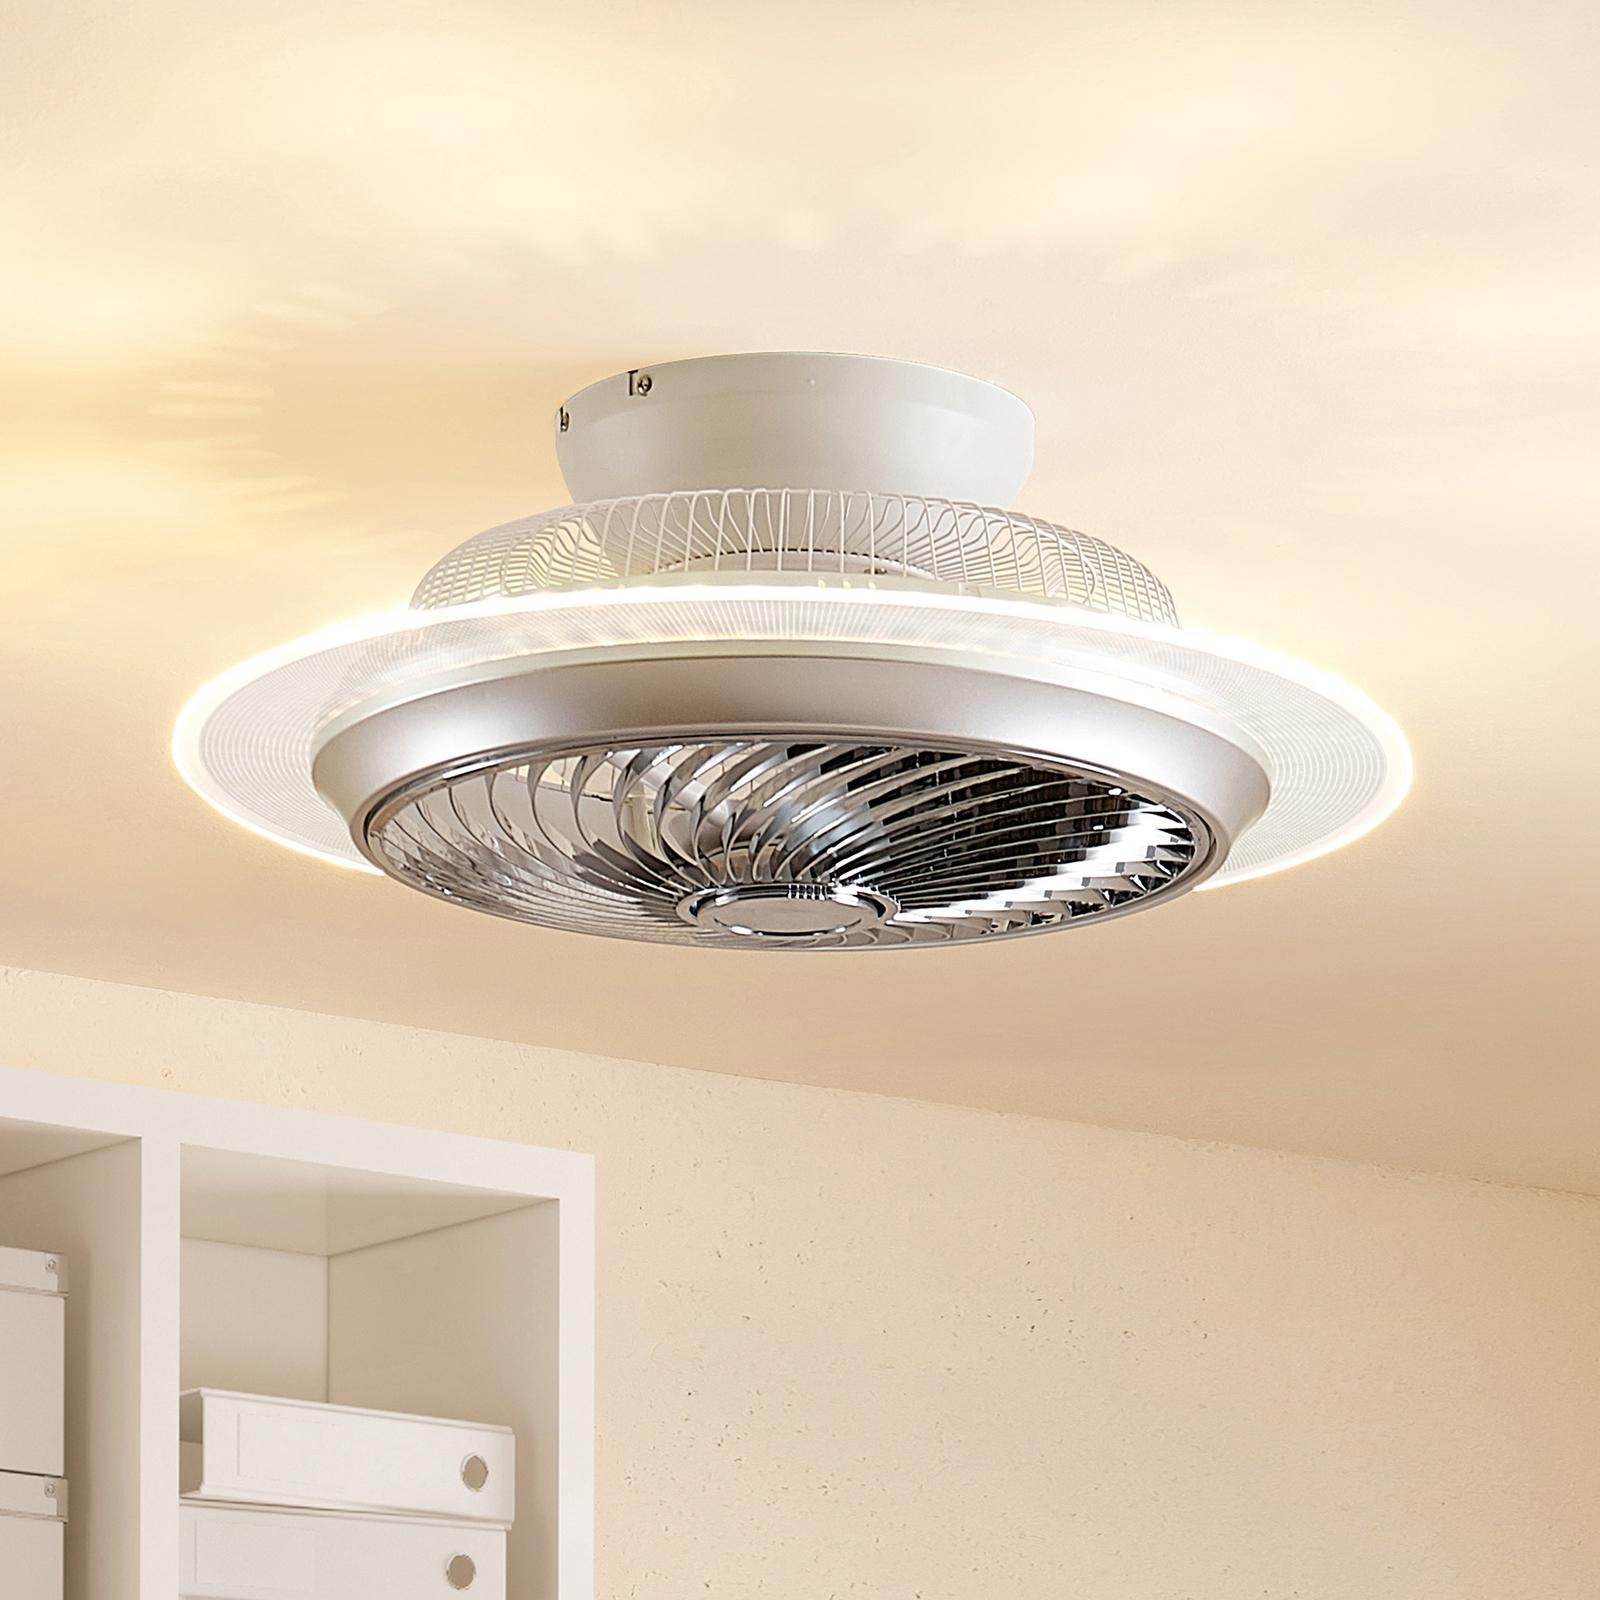 Lindby Yolina LED plafondventilator met licht